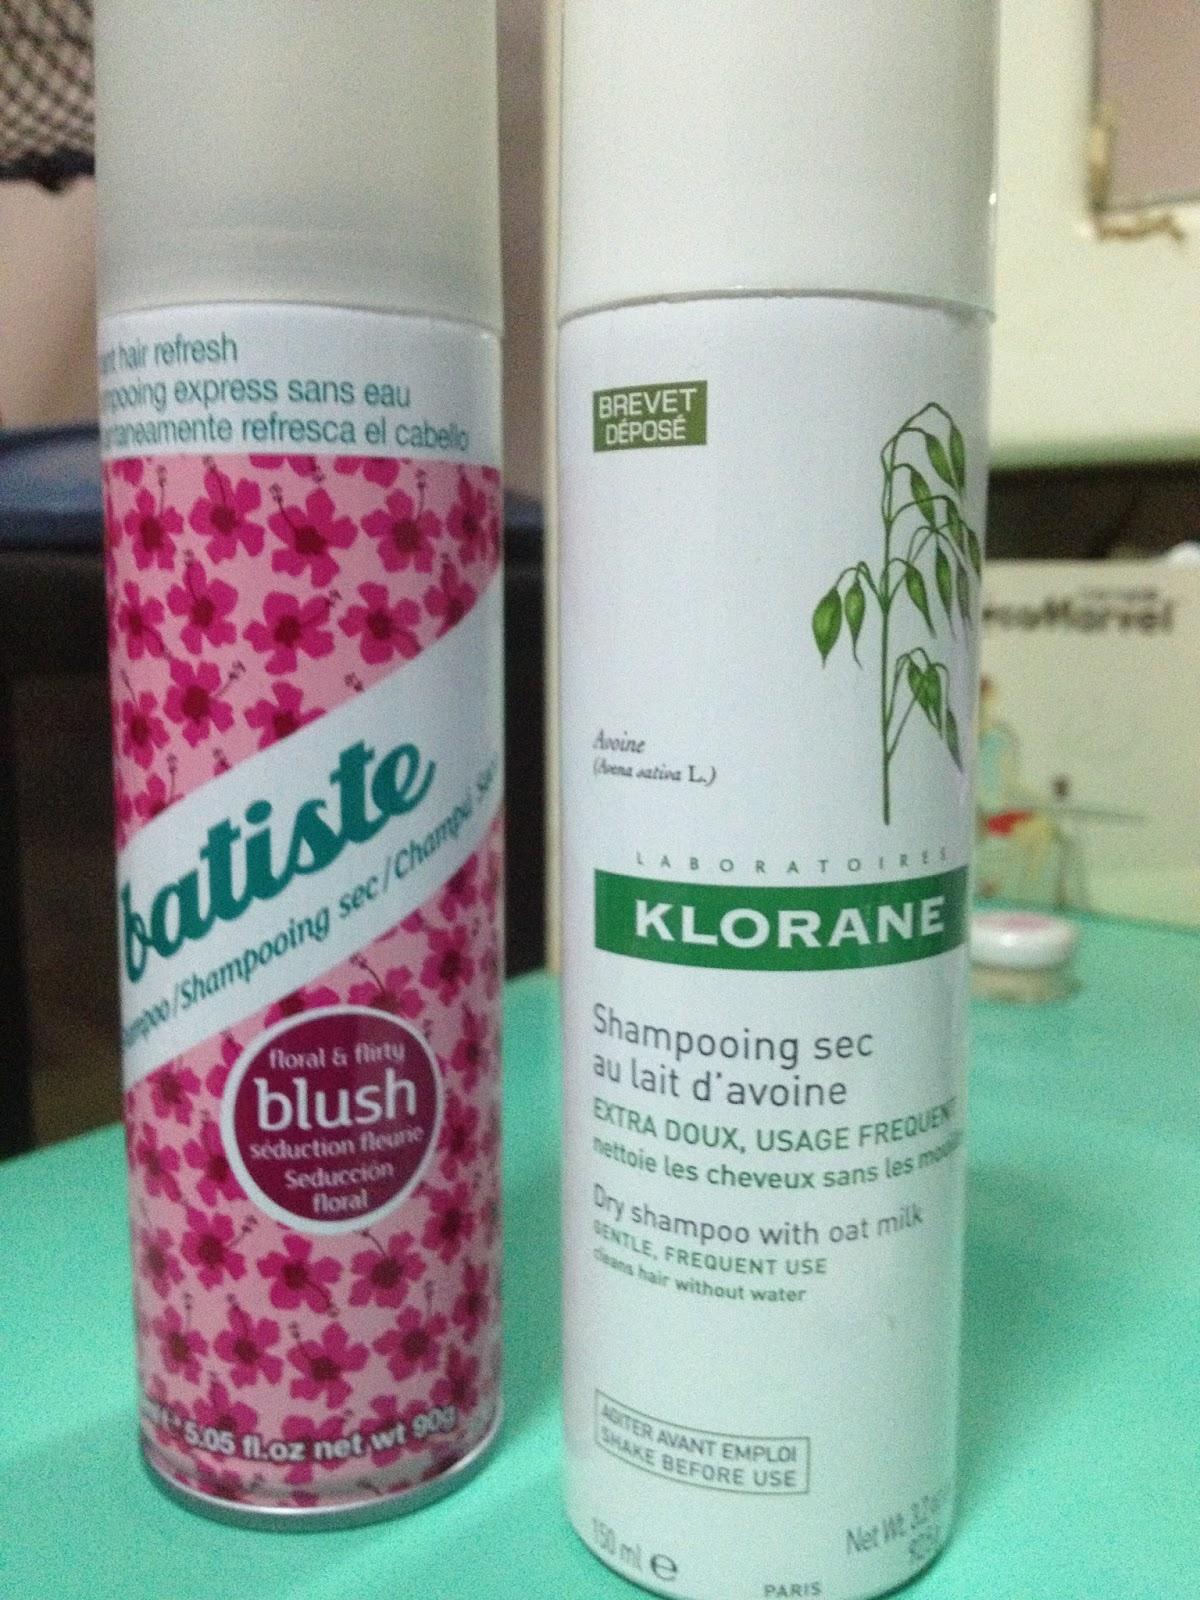 Klorane Dry Shampoo Vyingvanity Klorane Dry Shampoo Vs Batiste Dry Shampoo